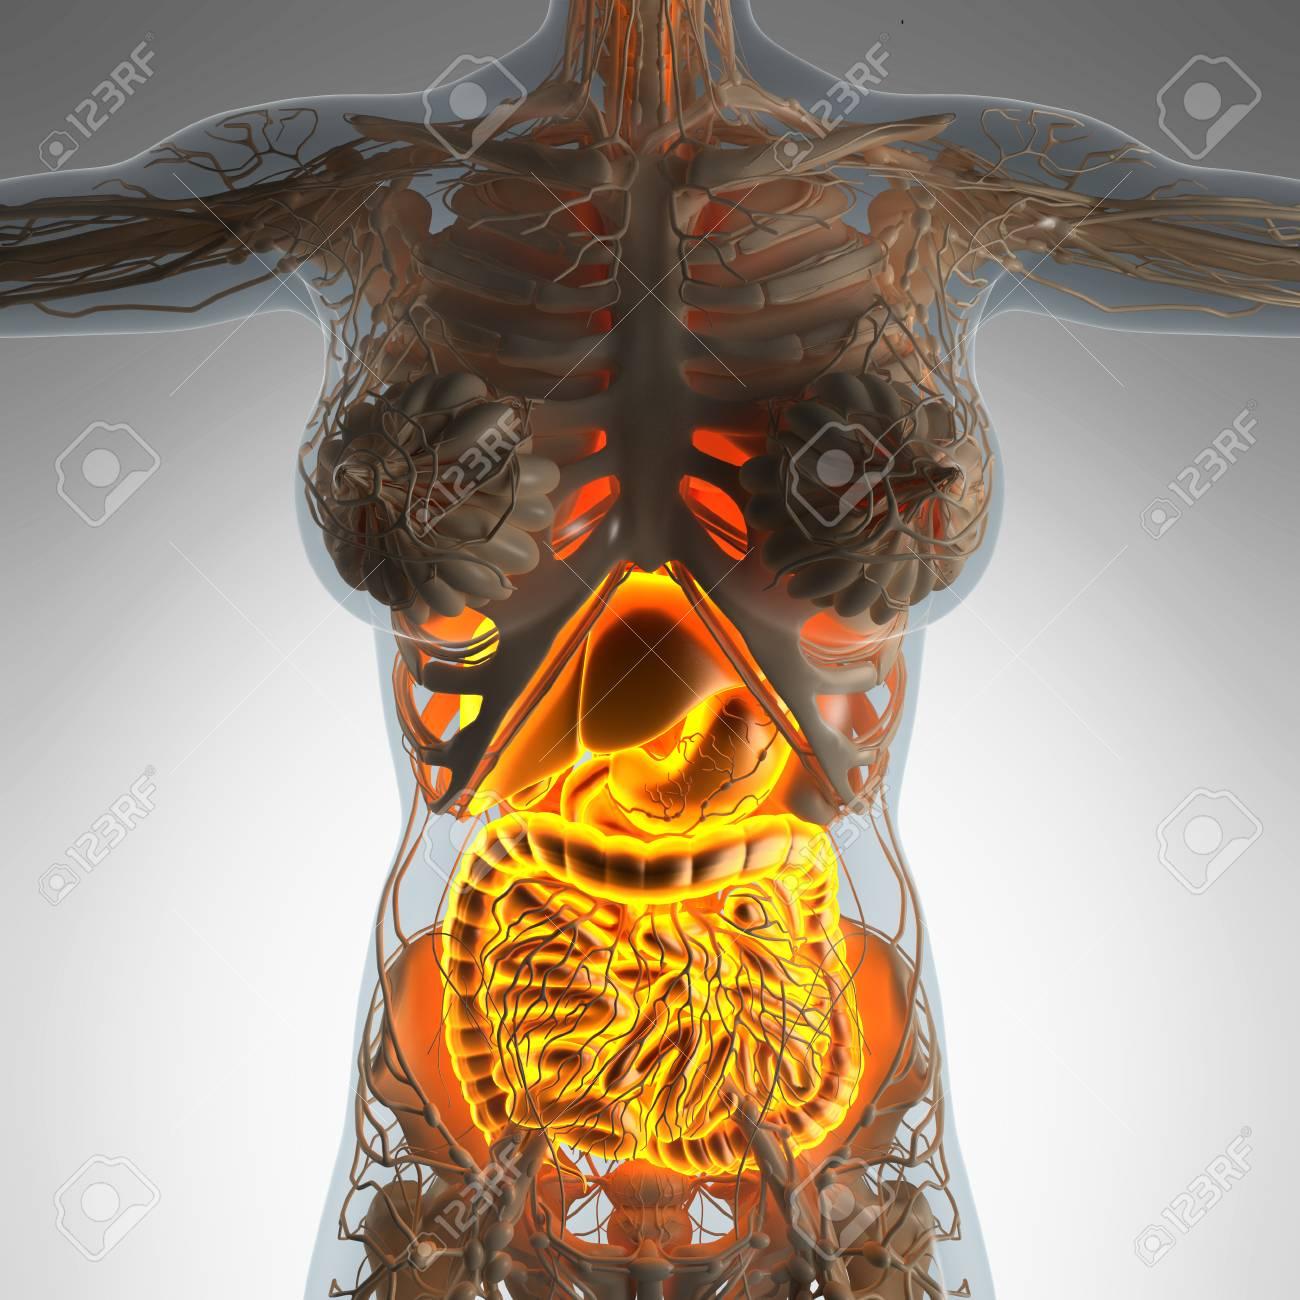 Science Anatomy Of Woman Body With Glow Digestive System Stock Photo ...